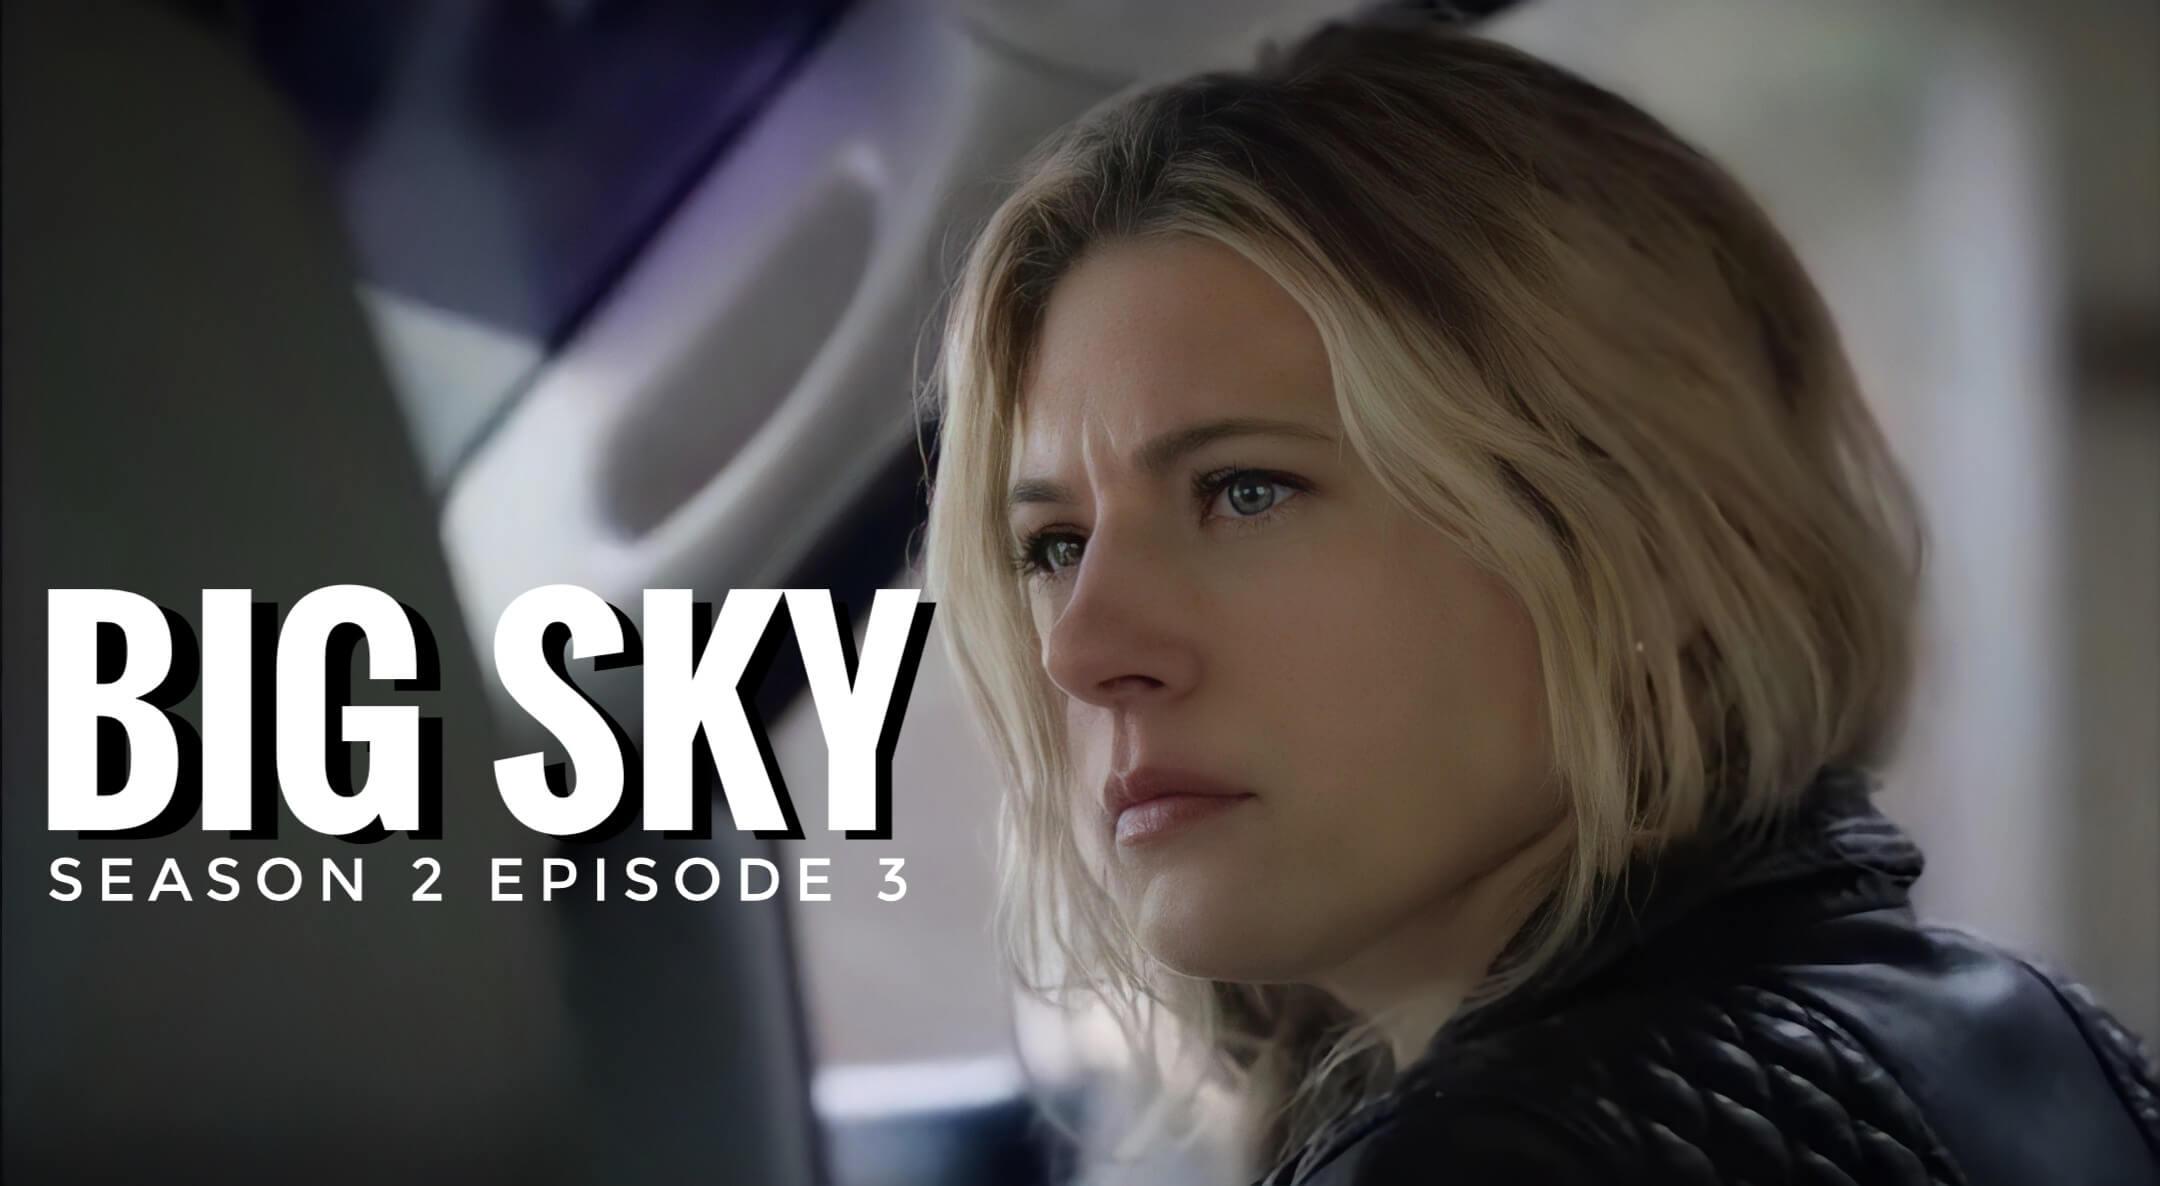 Big sky season 2 episode 3 release date